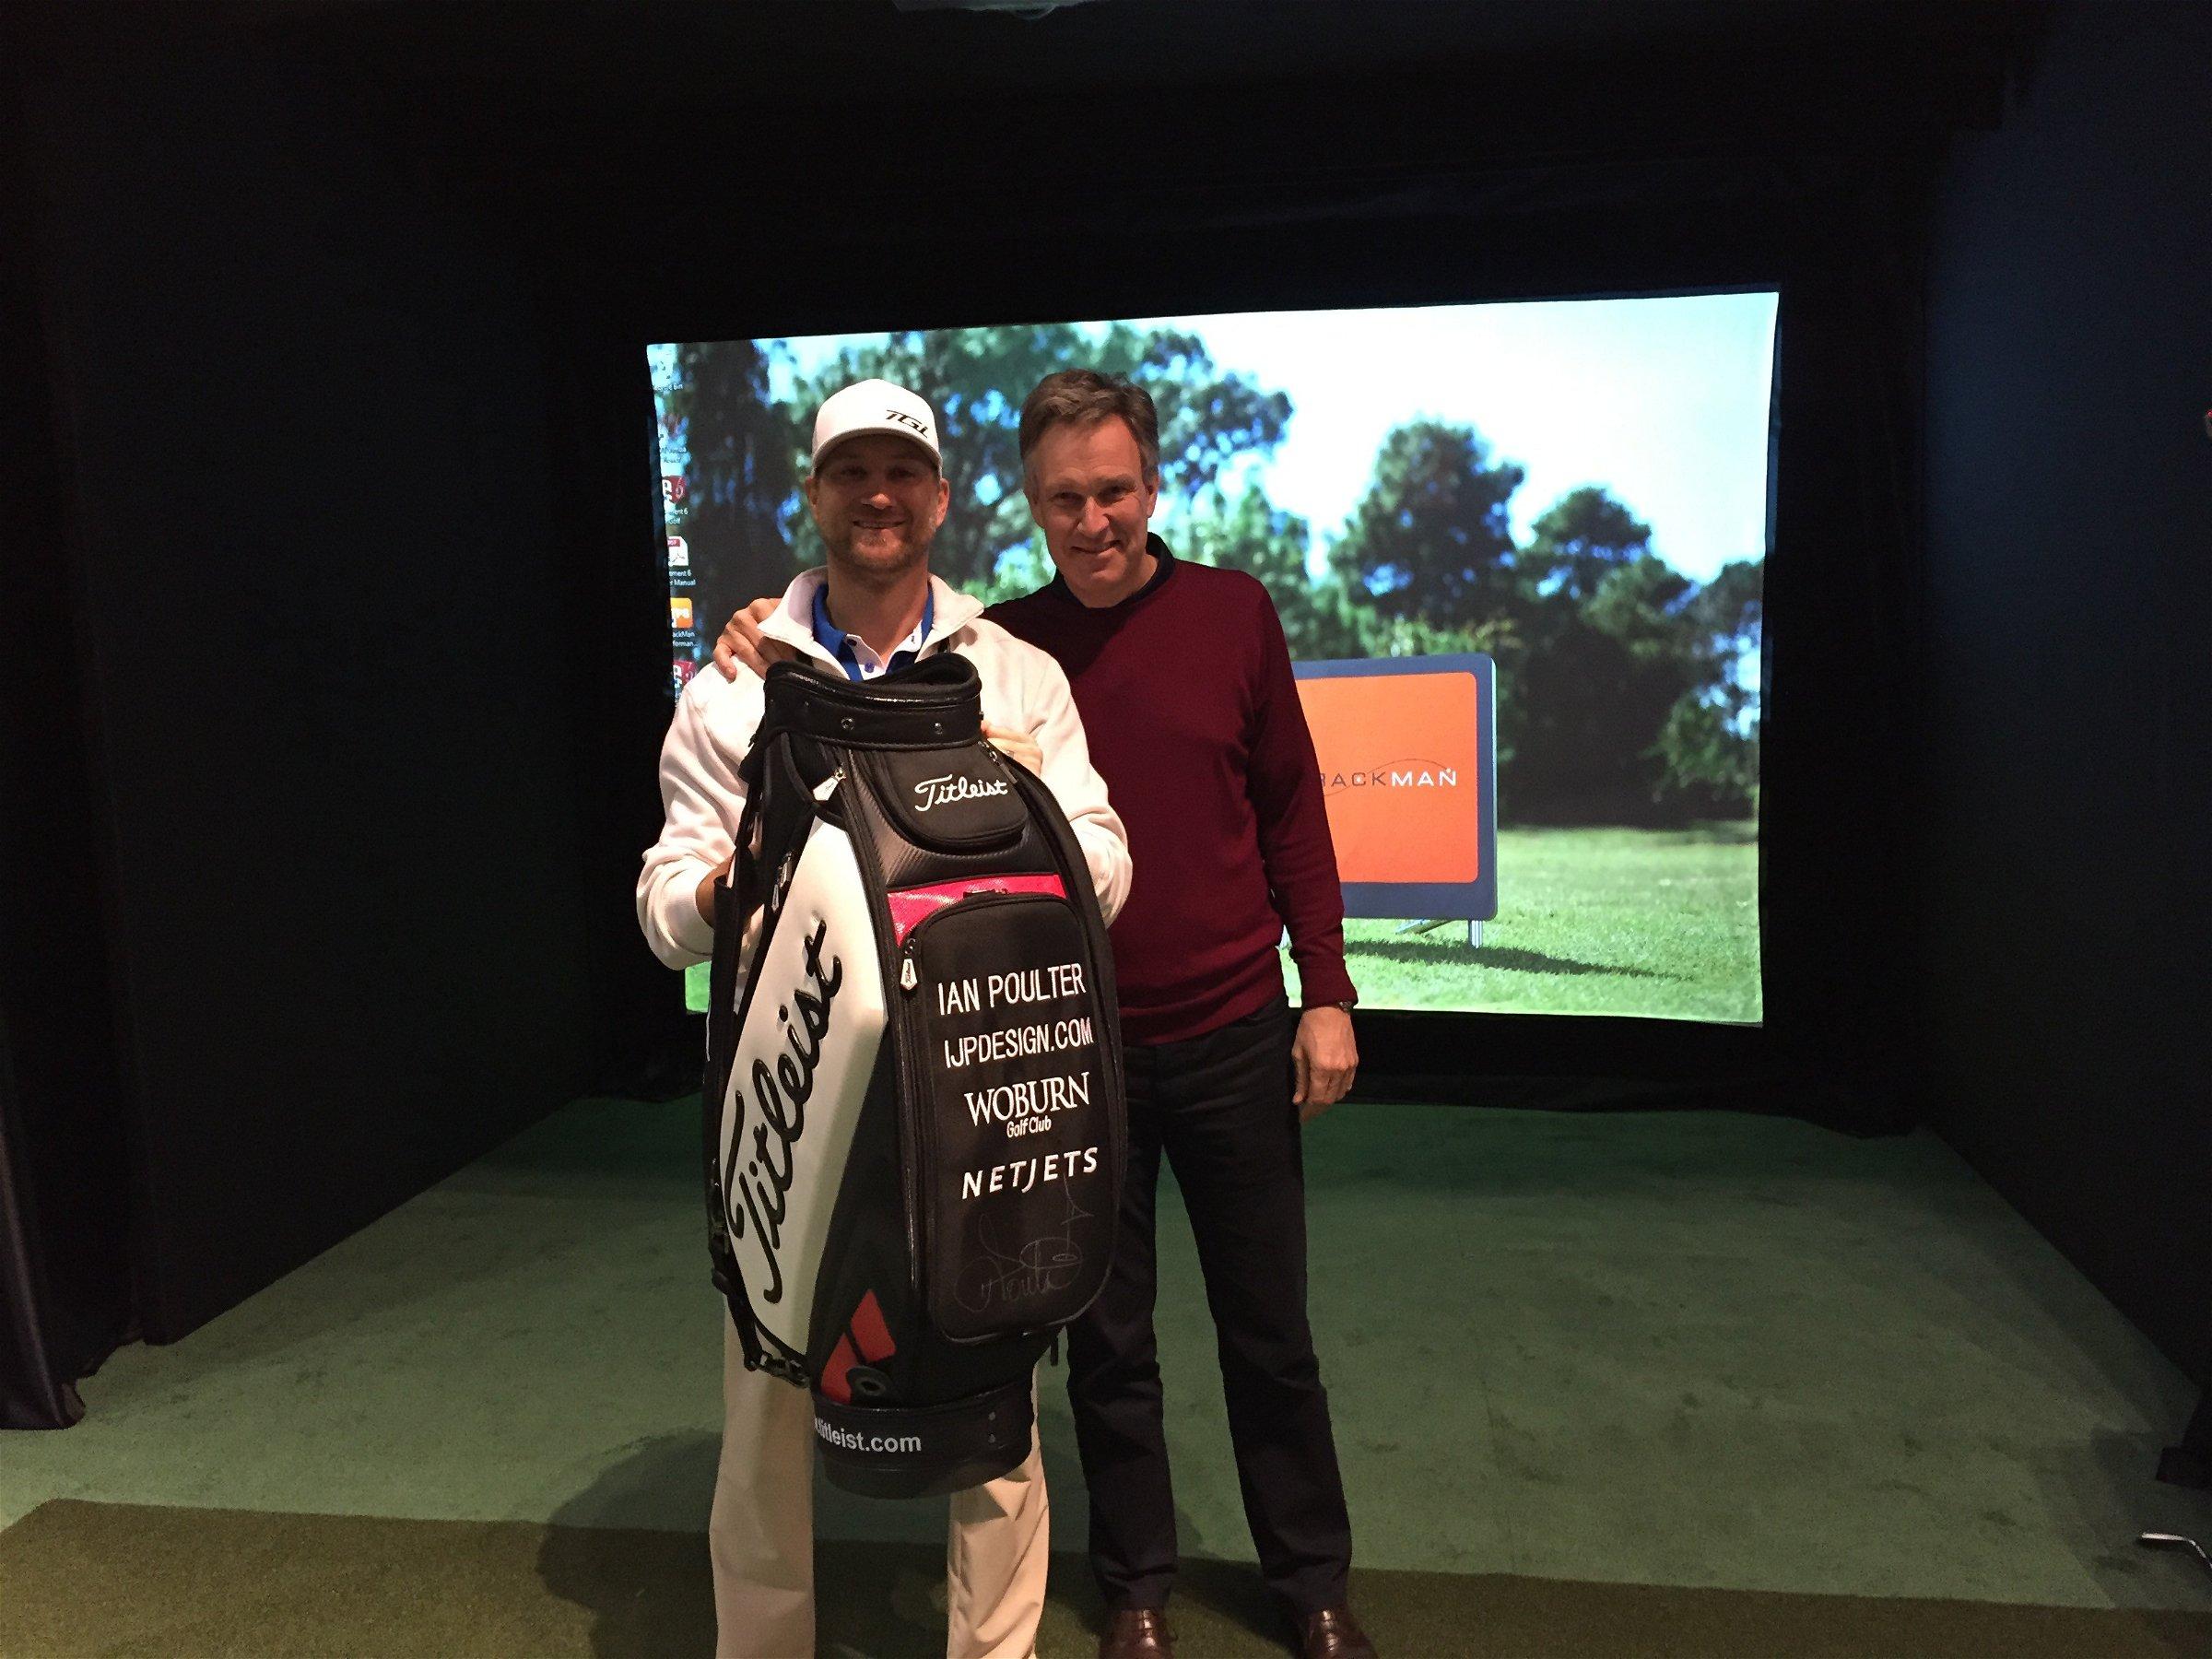 TrackMan Simulator Ian Poulter Staff bag winner